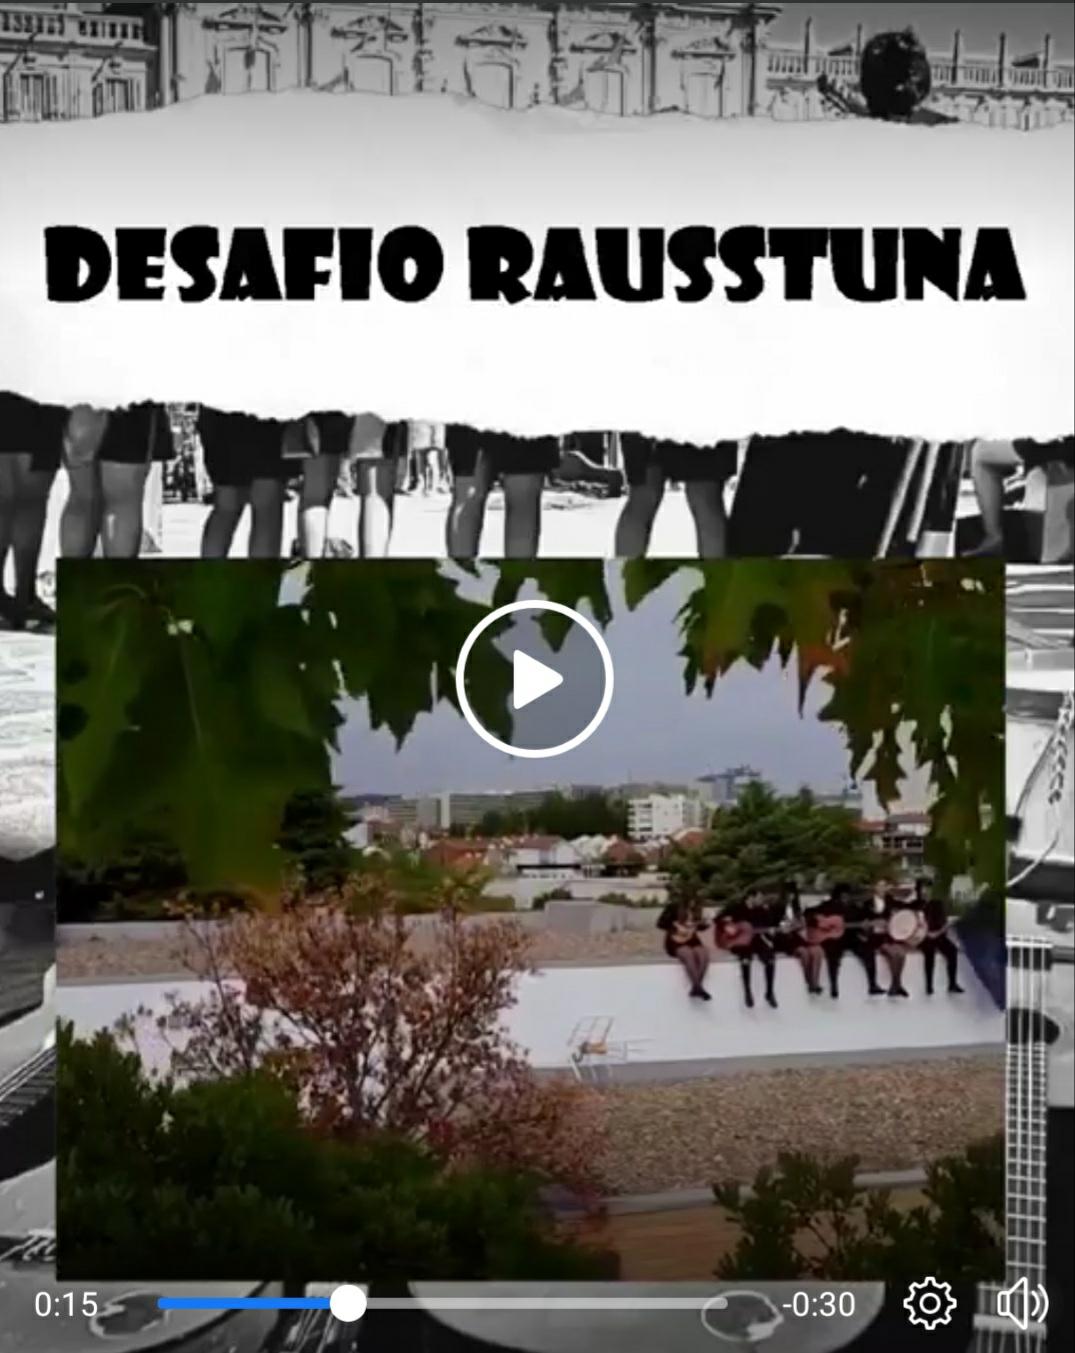 Desafio Rausstuna - Original